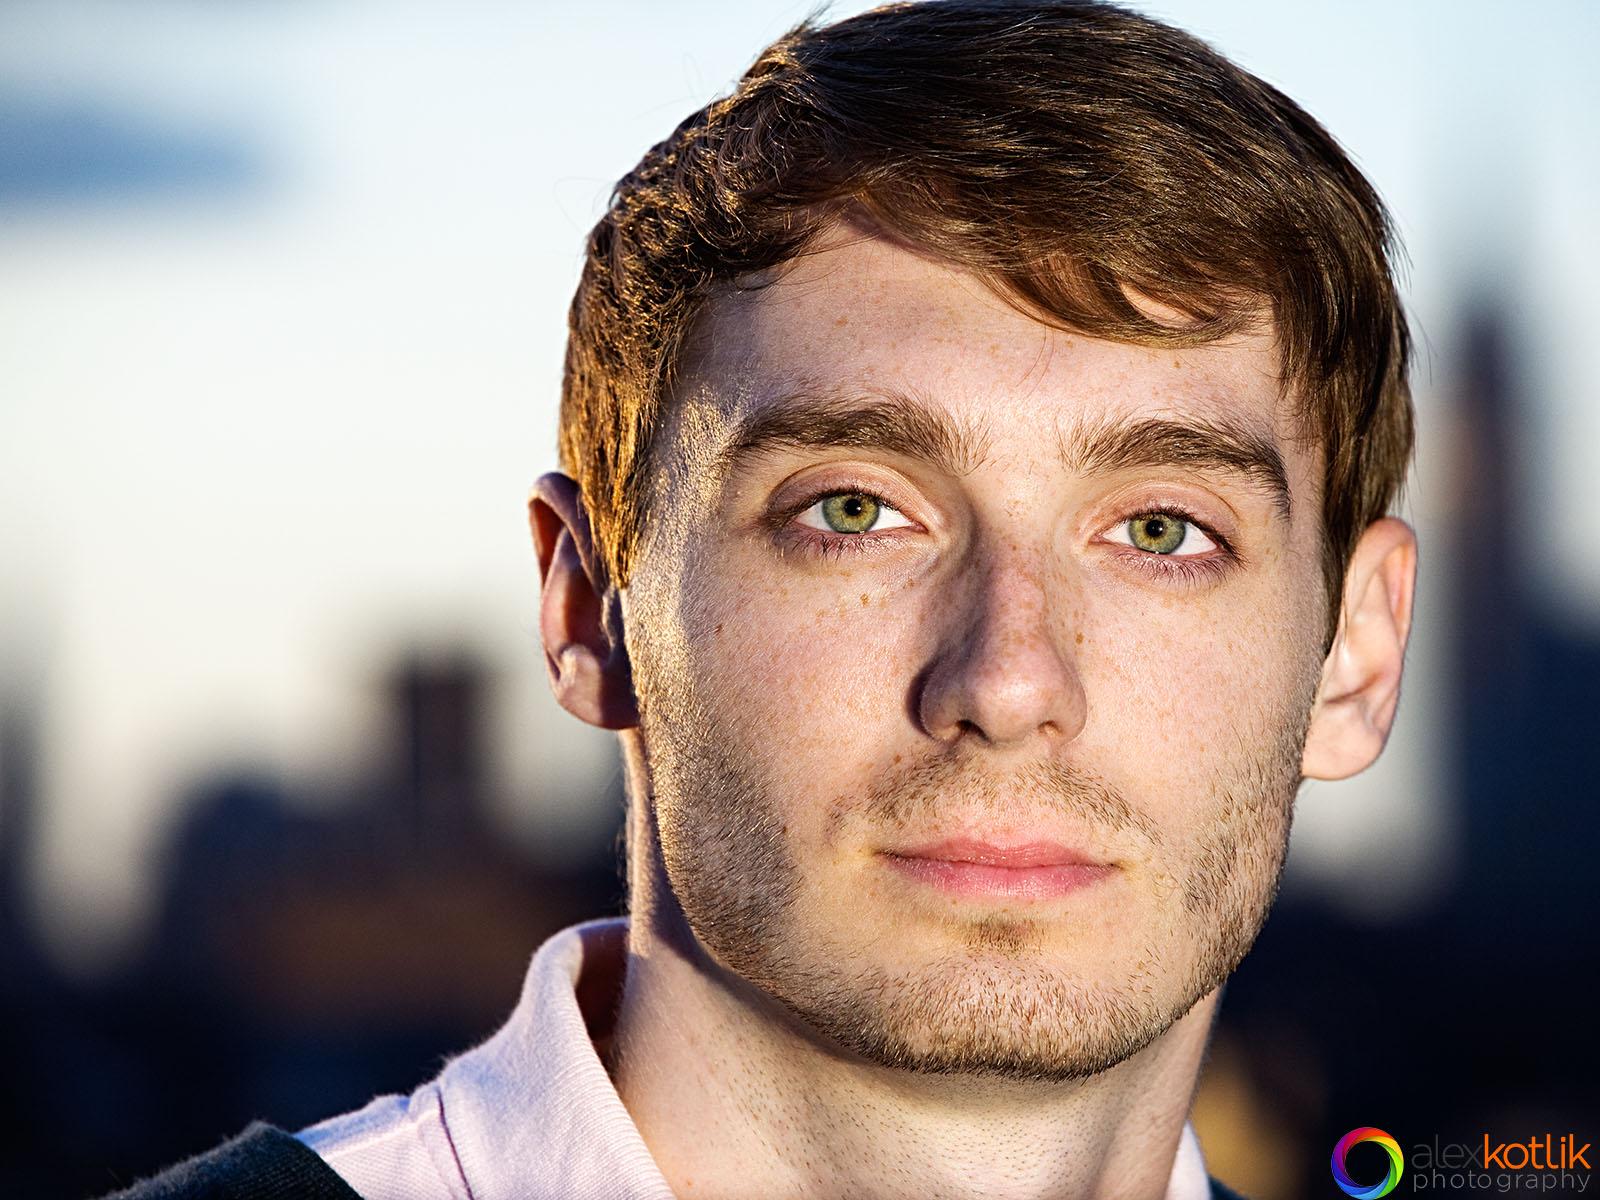 headshot of Scott, actor and model